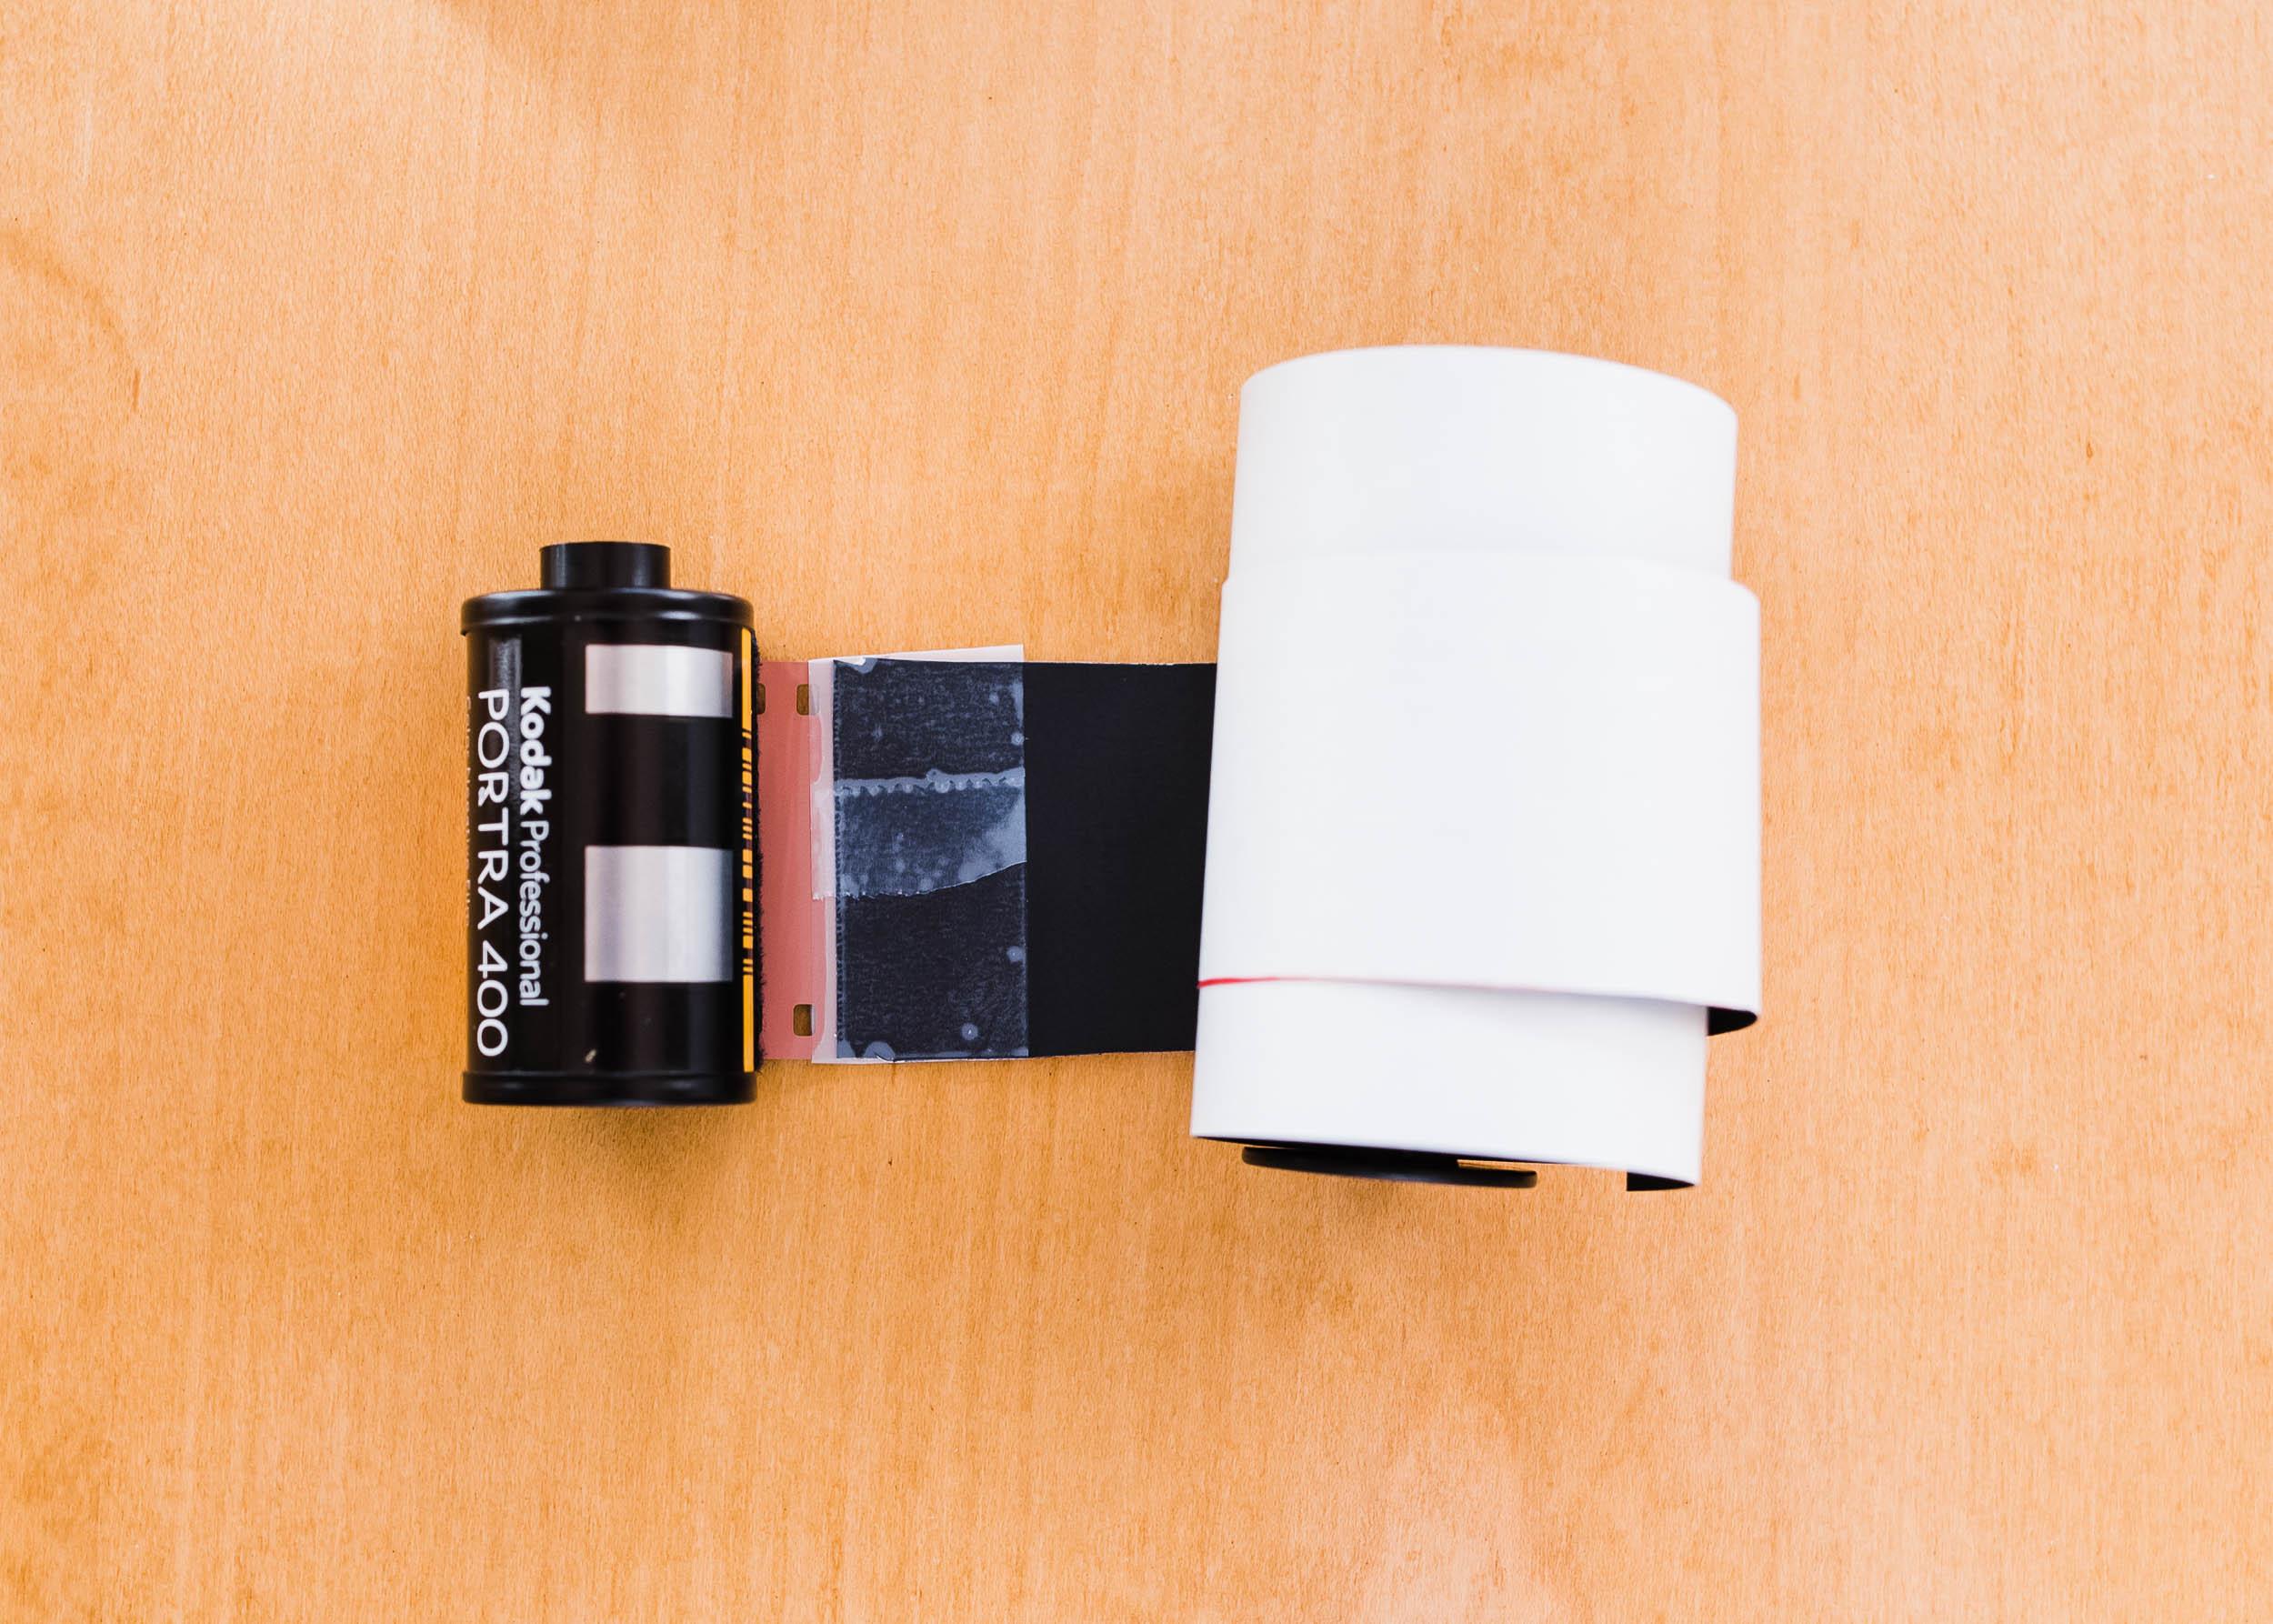 Pentax 67 35mm panorama step 5